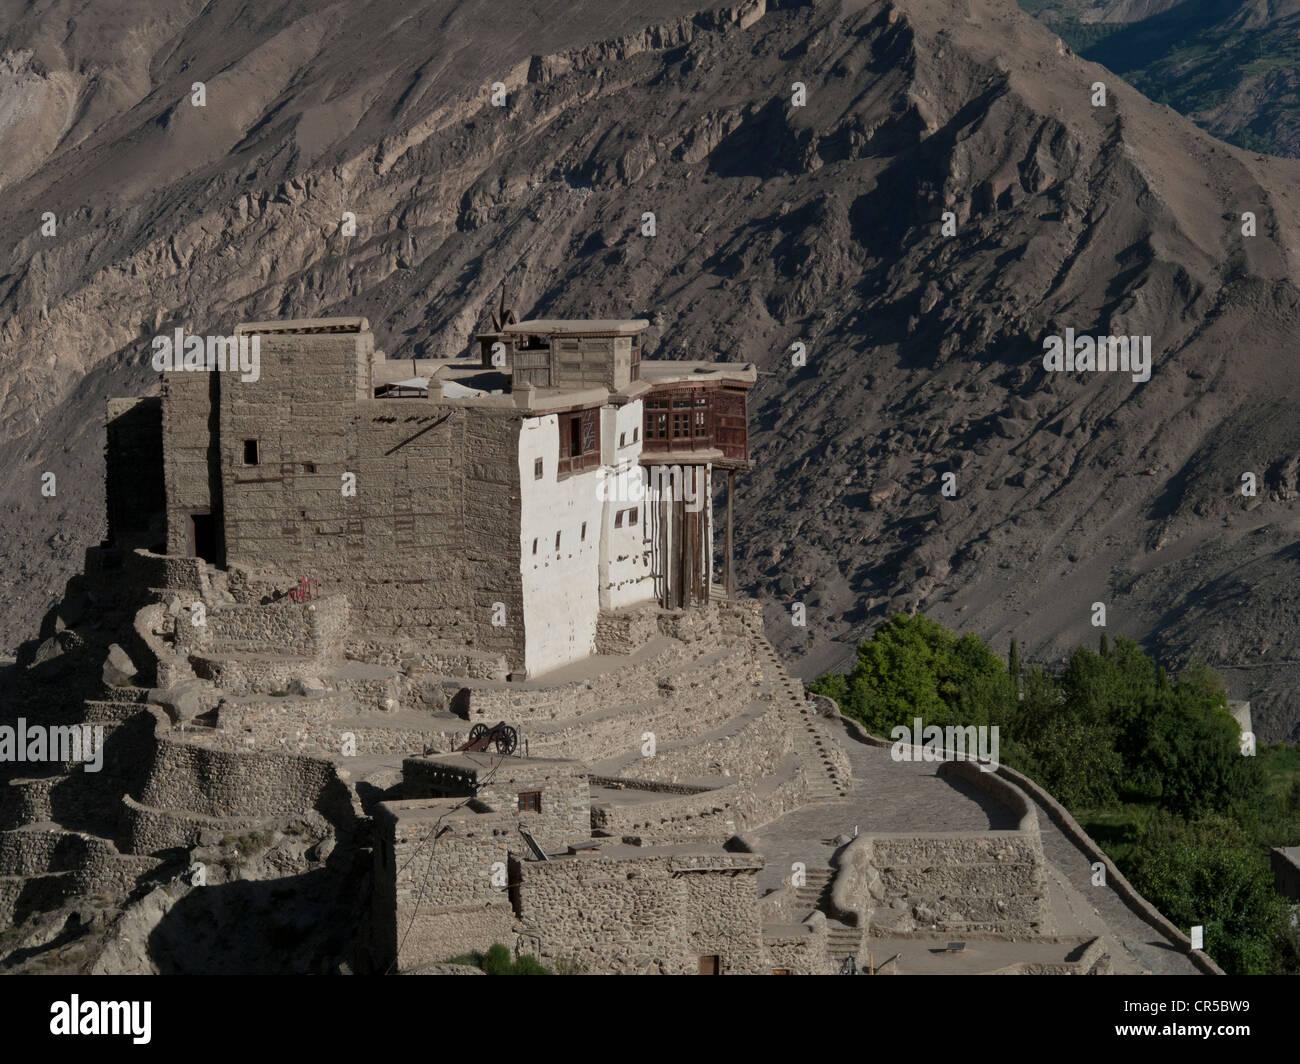 The old Fort of Karimabad overlooking the Karakorum Highway, North West Frontier, Pakistan, South Asia - Stock Image